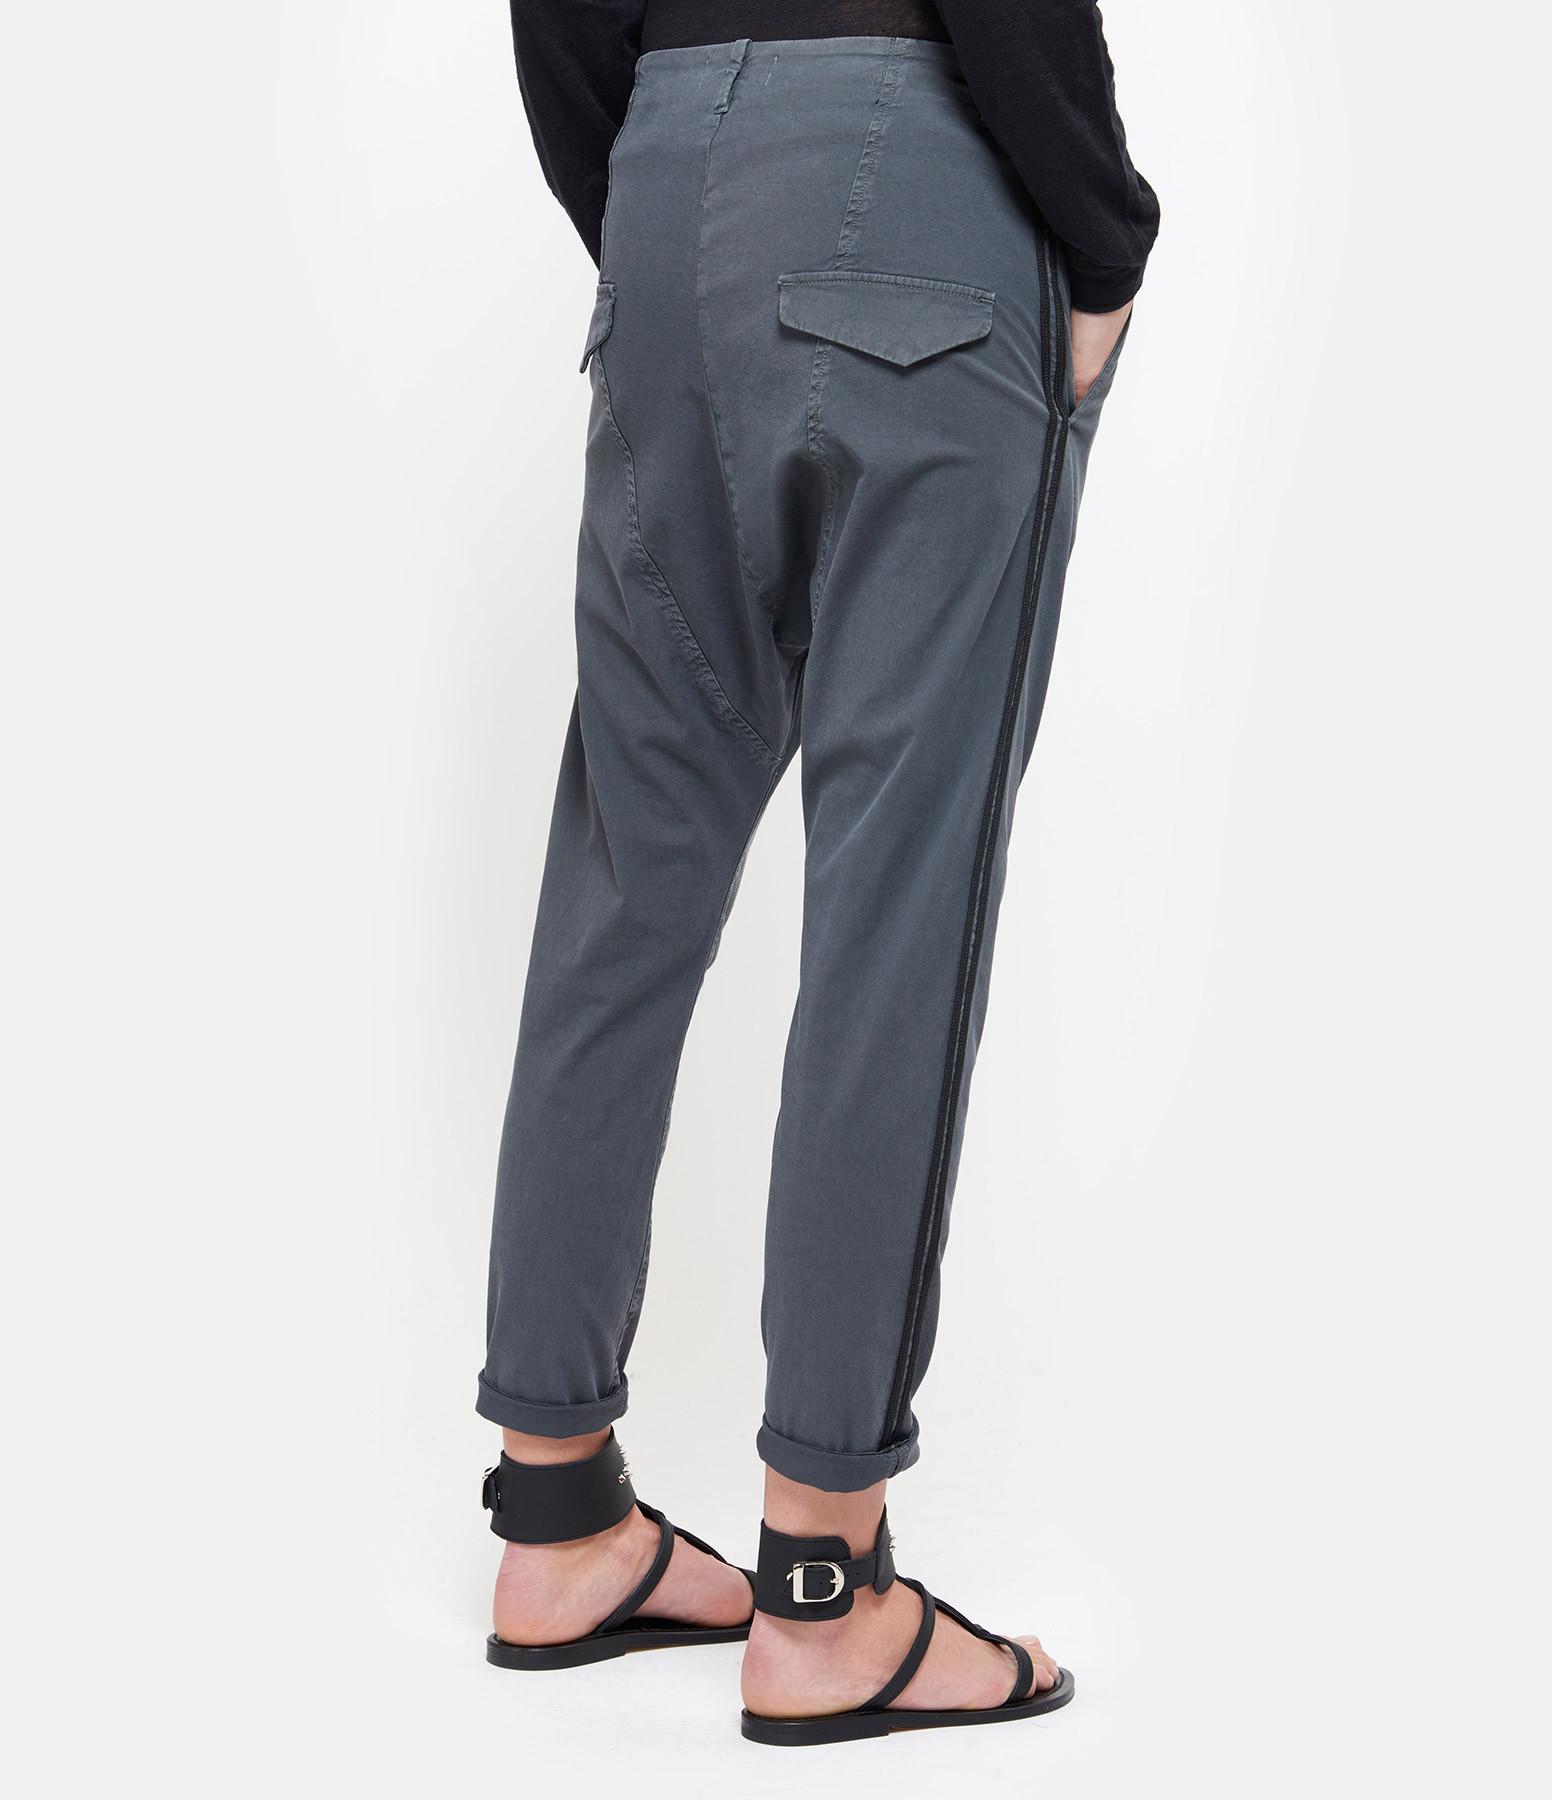 NILI LOTAN - Pantalon Paris Coton Charbon